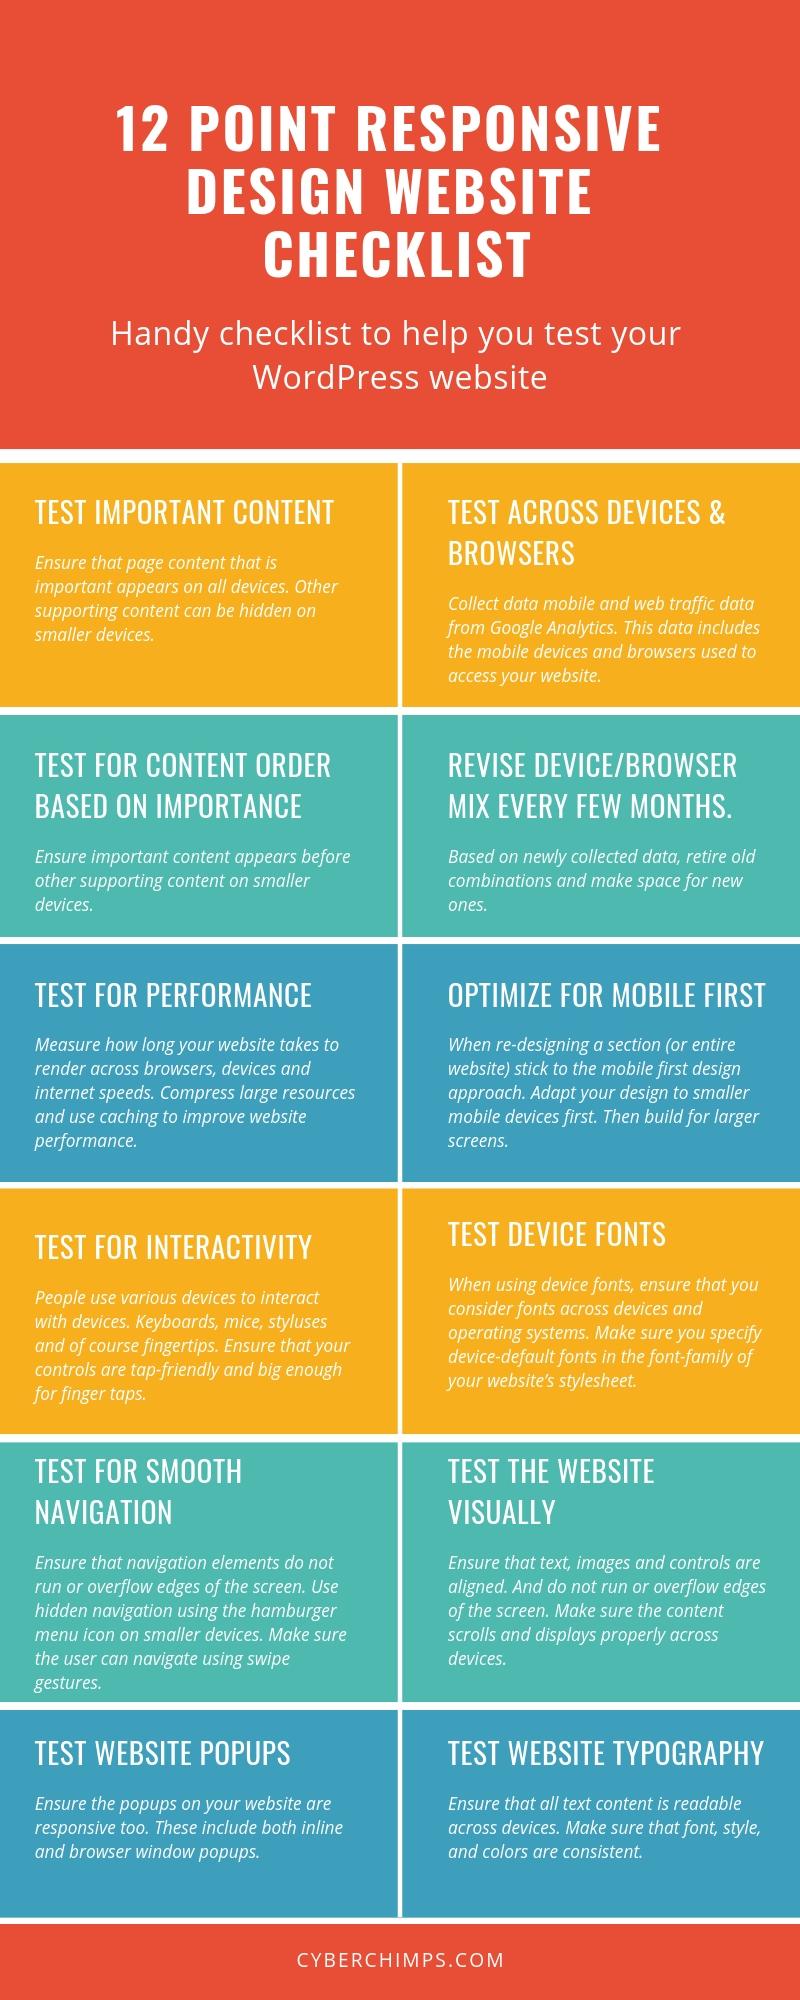 Responsive web design checklist